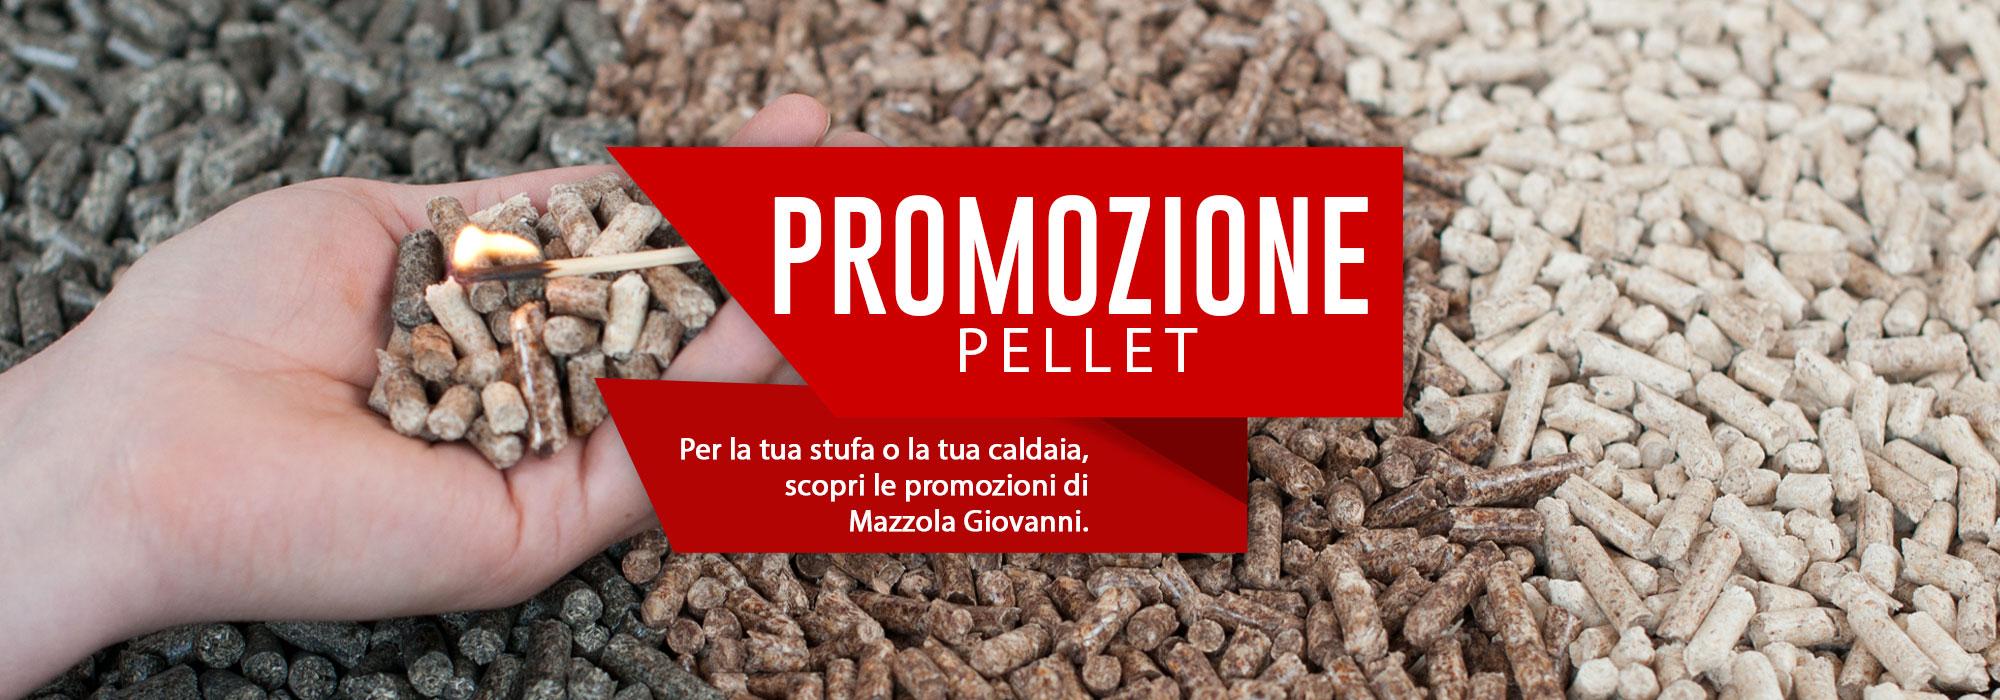 slide_promo-pellet2